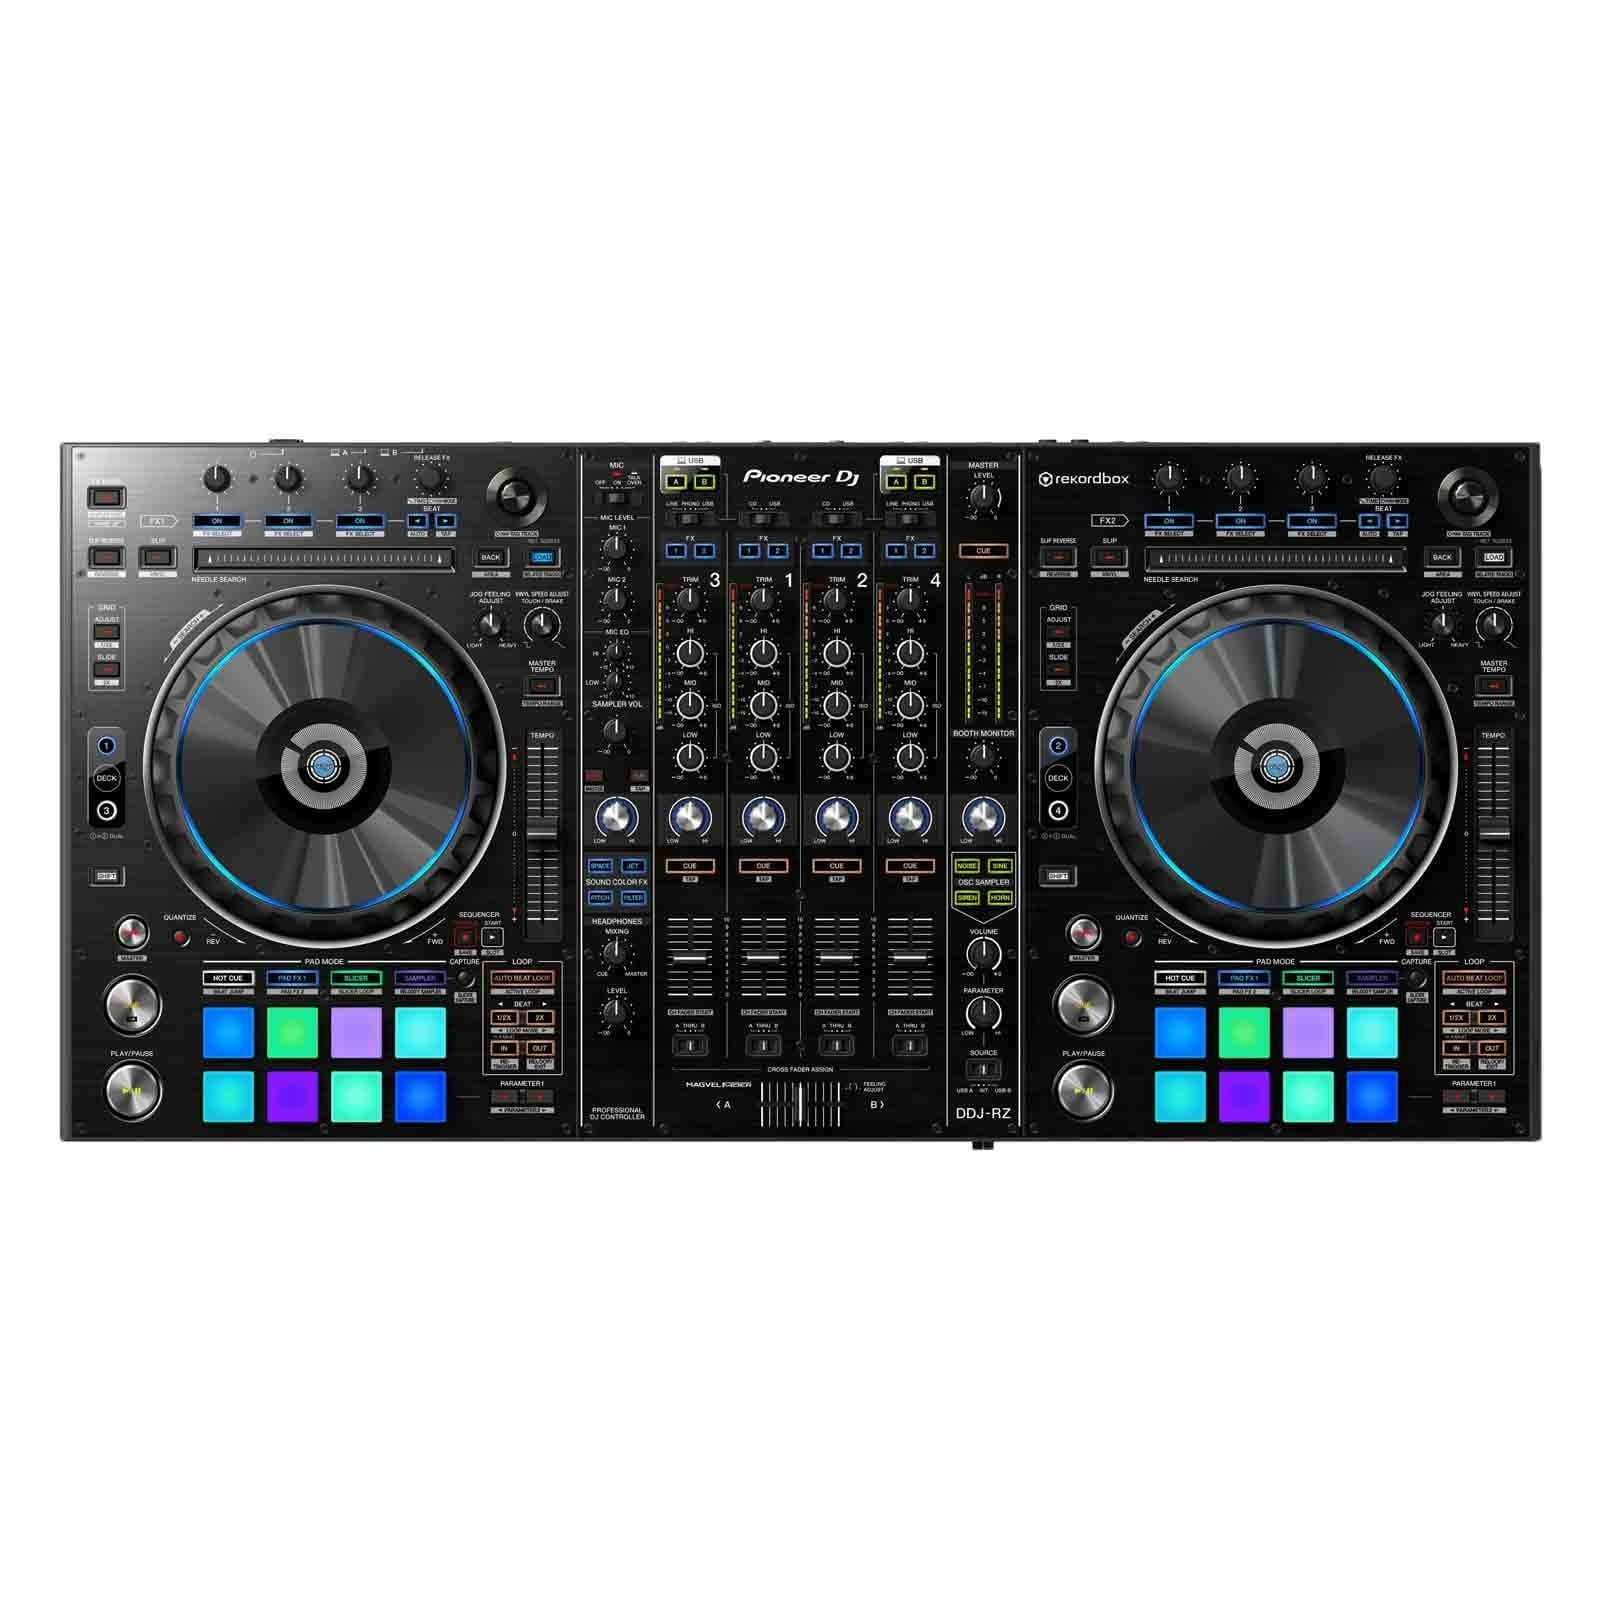 pioneer-ddj-rz-professional-4-channel-rekordbox-dj-controller-with-performance-pads-a6a